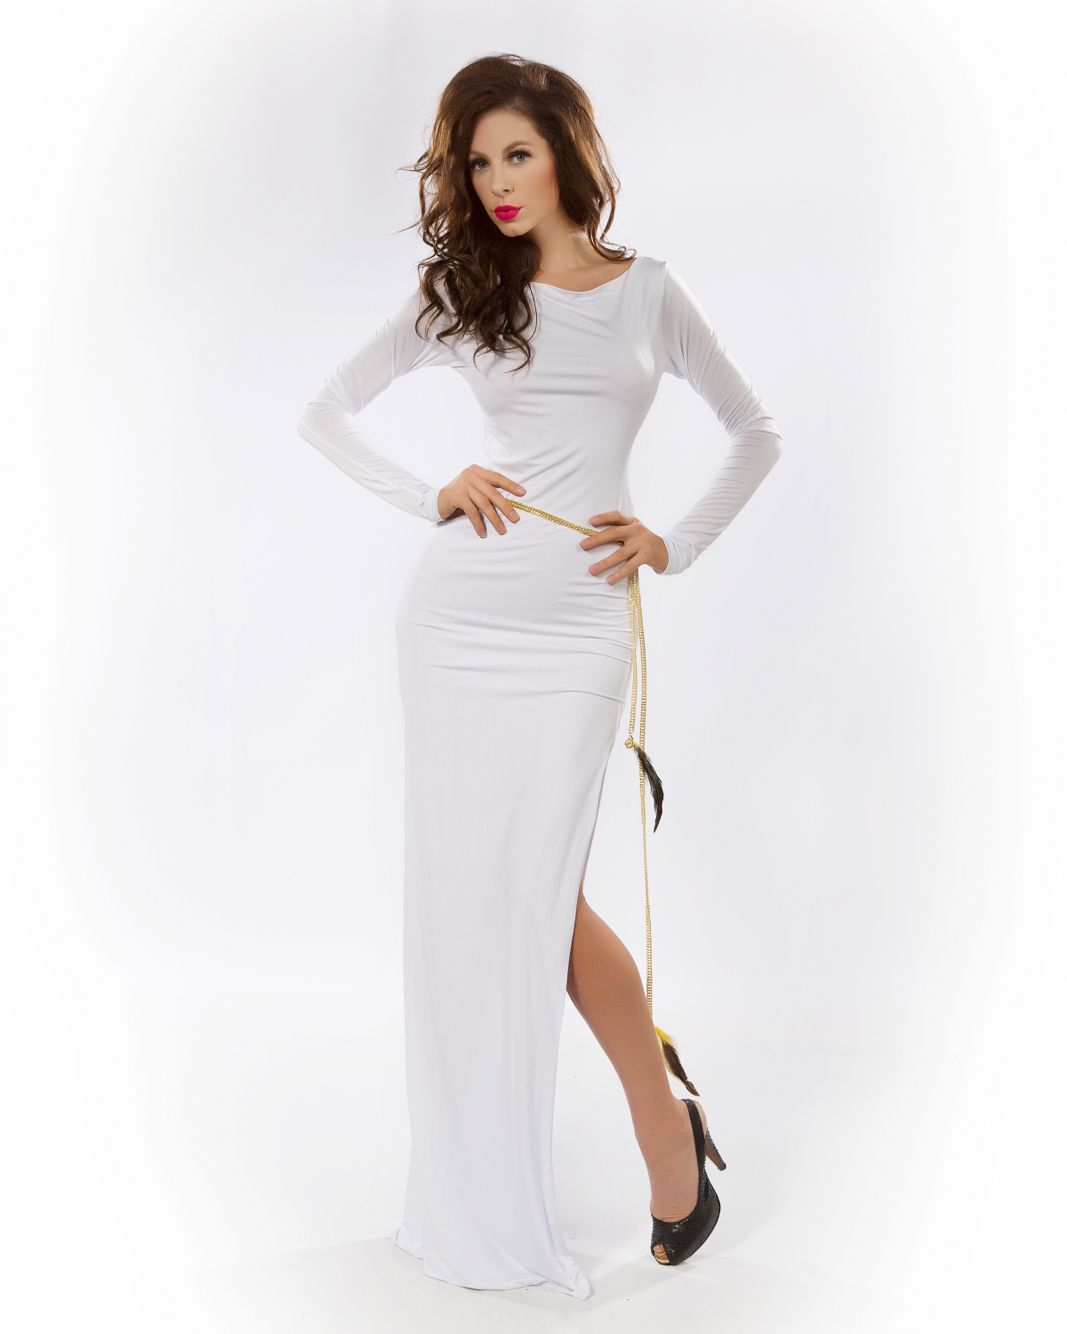 Dresses, Prom dresses long, Prom dresses